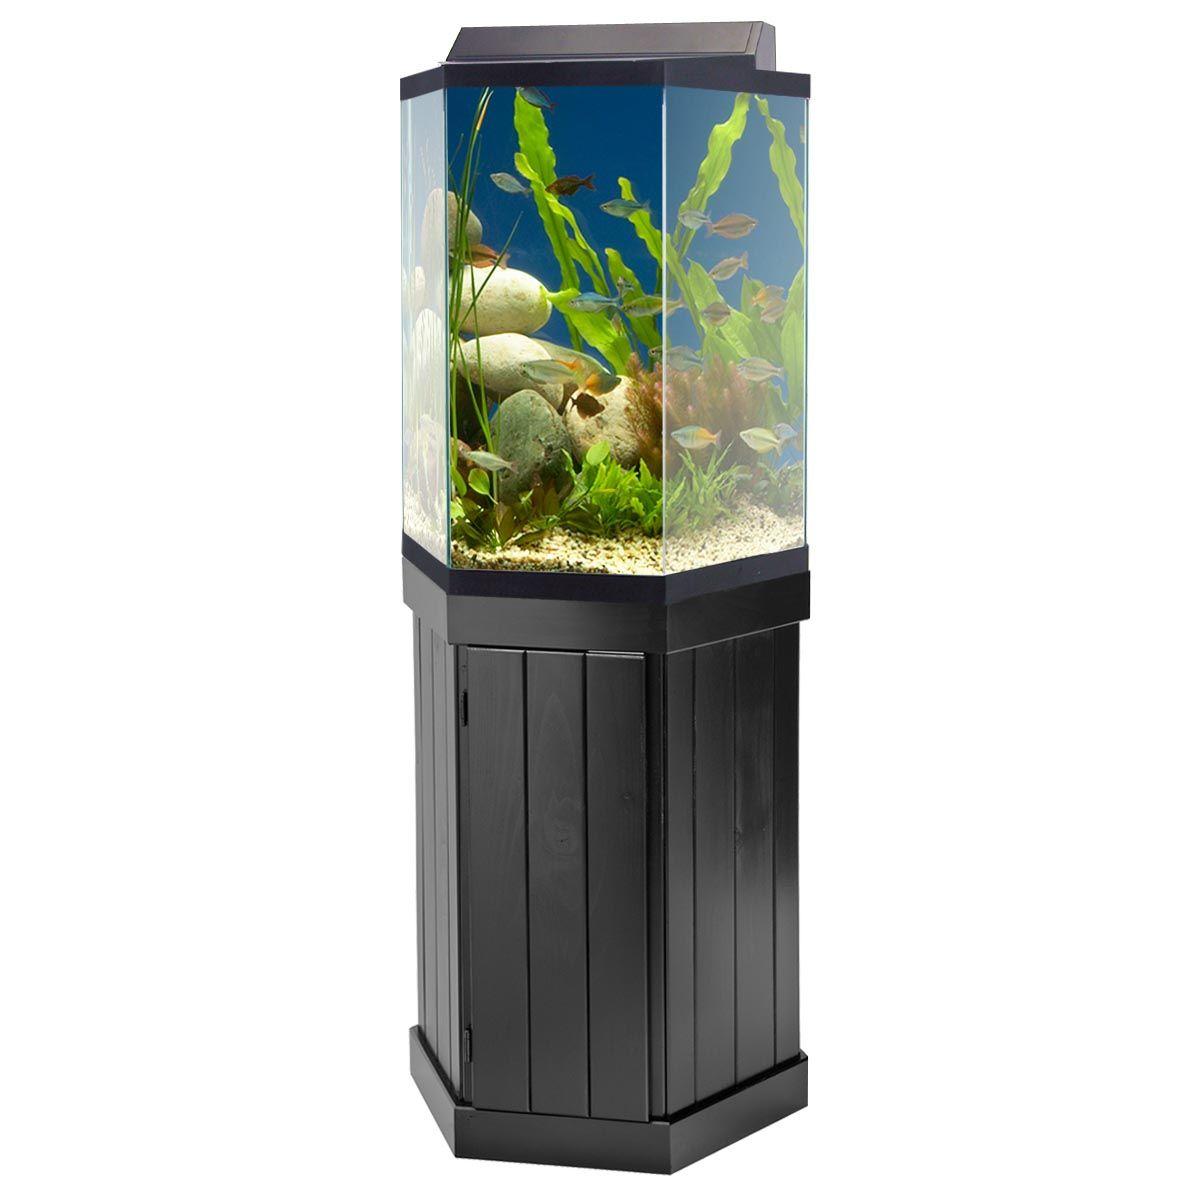 Fish aquarium in rawalpindi - Hexagon Fish Aquarium With Stand